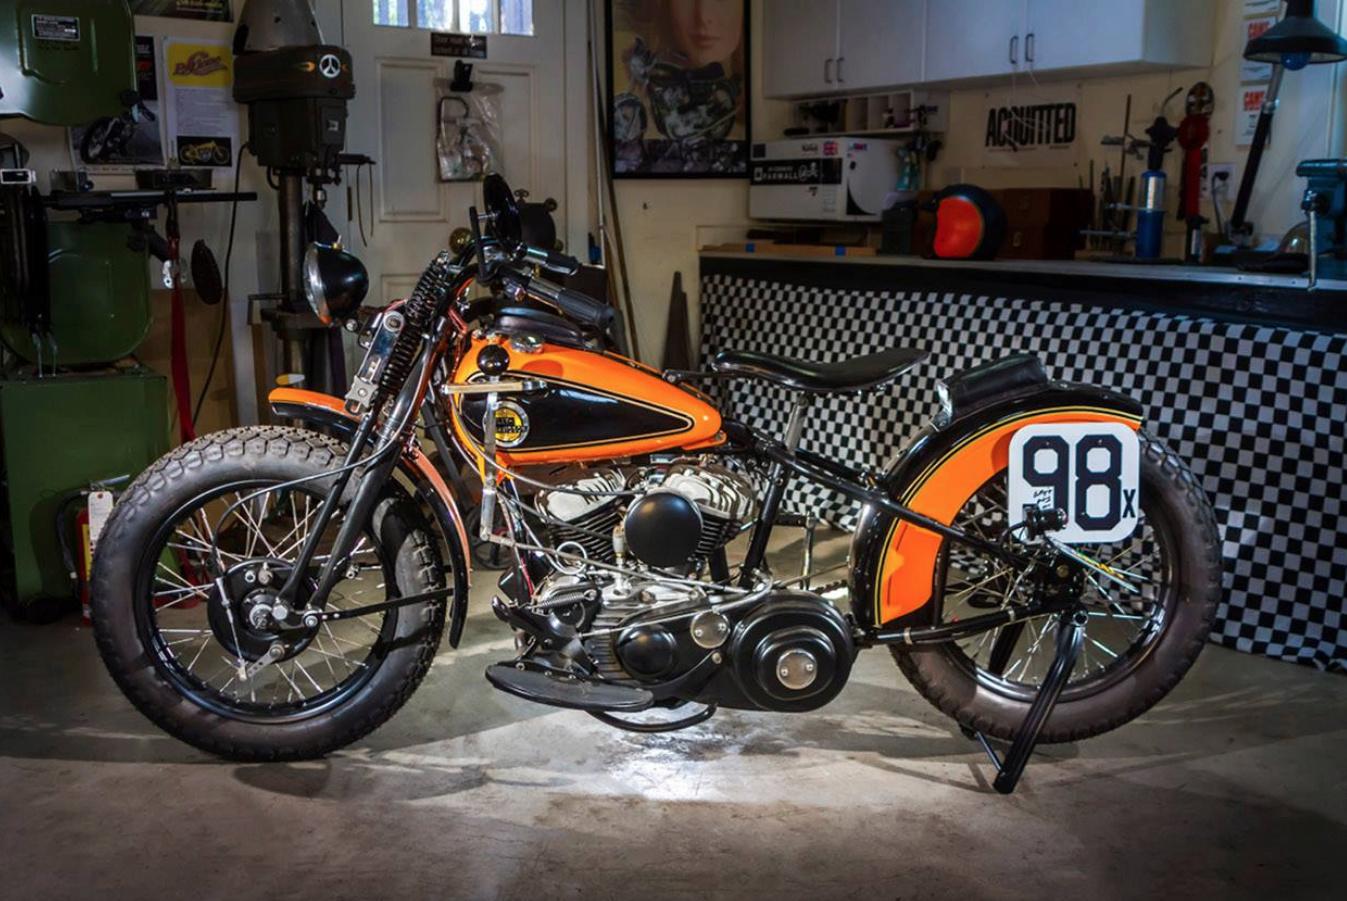 Harley de course - Page 17 Captu842